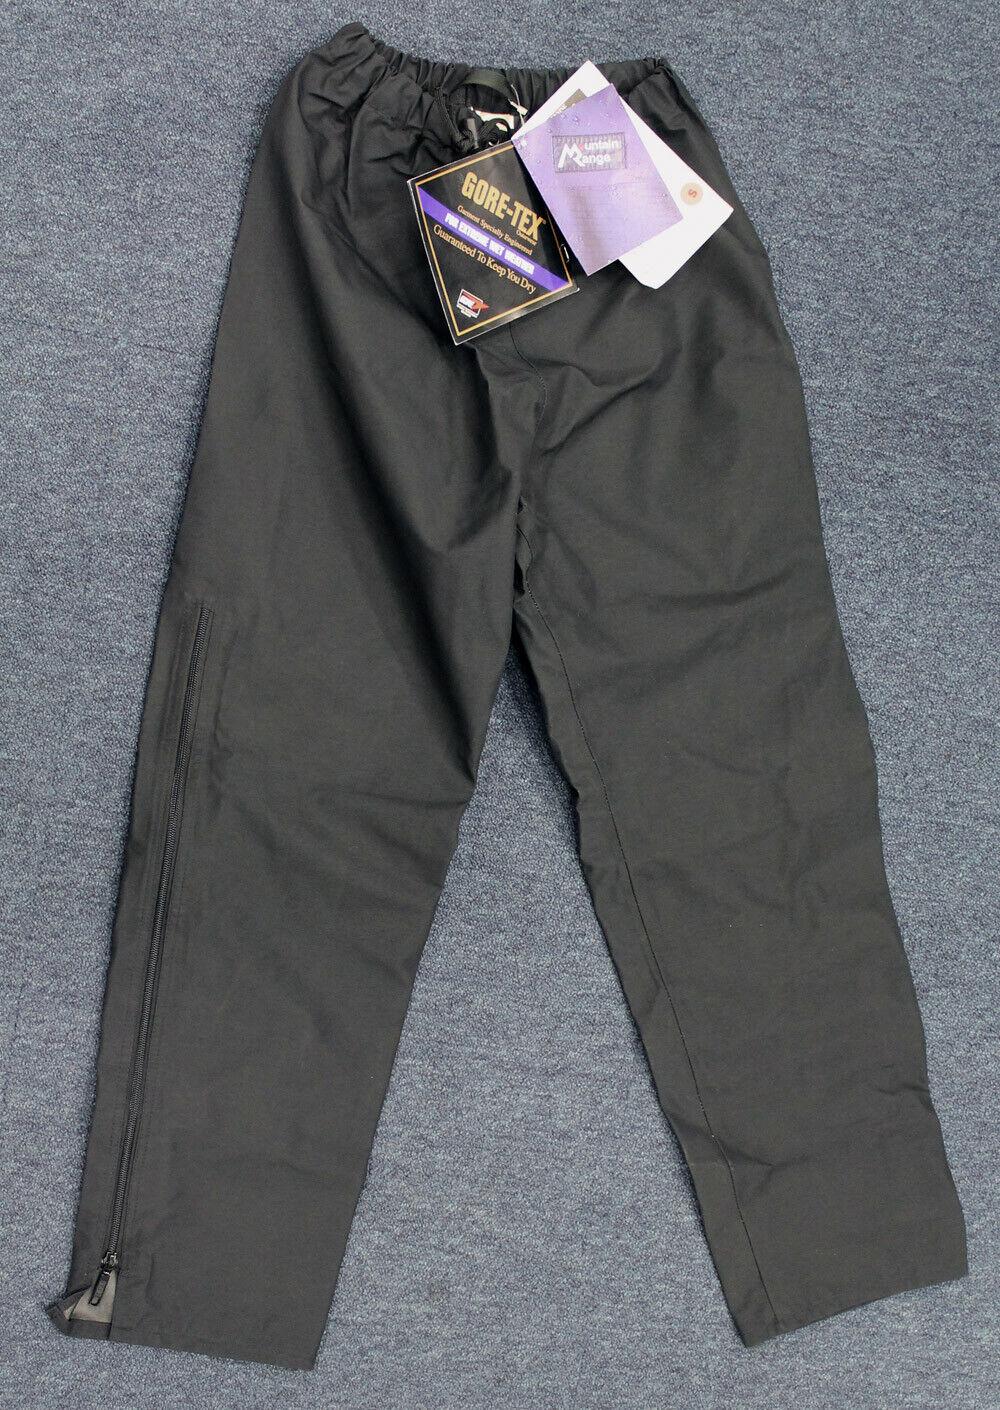 Un Par cordillera Pennine GORE-TEX Pantalones, Negro, Pequeño [s]